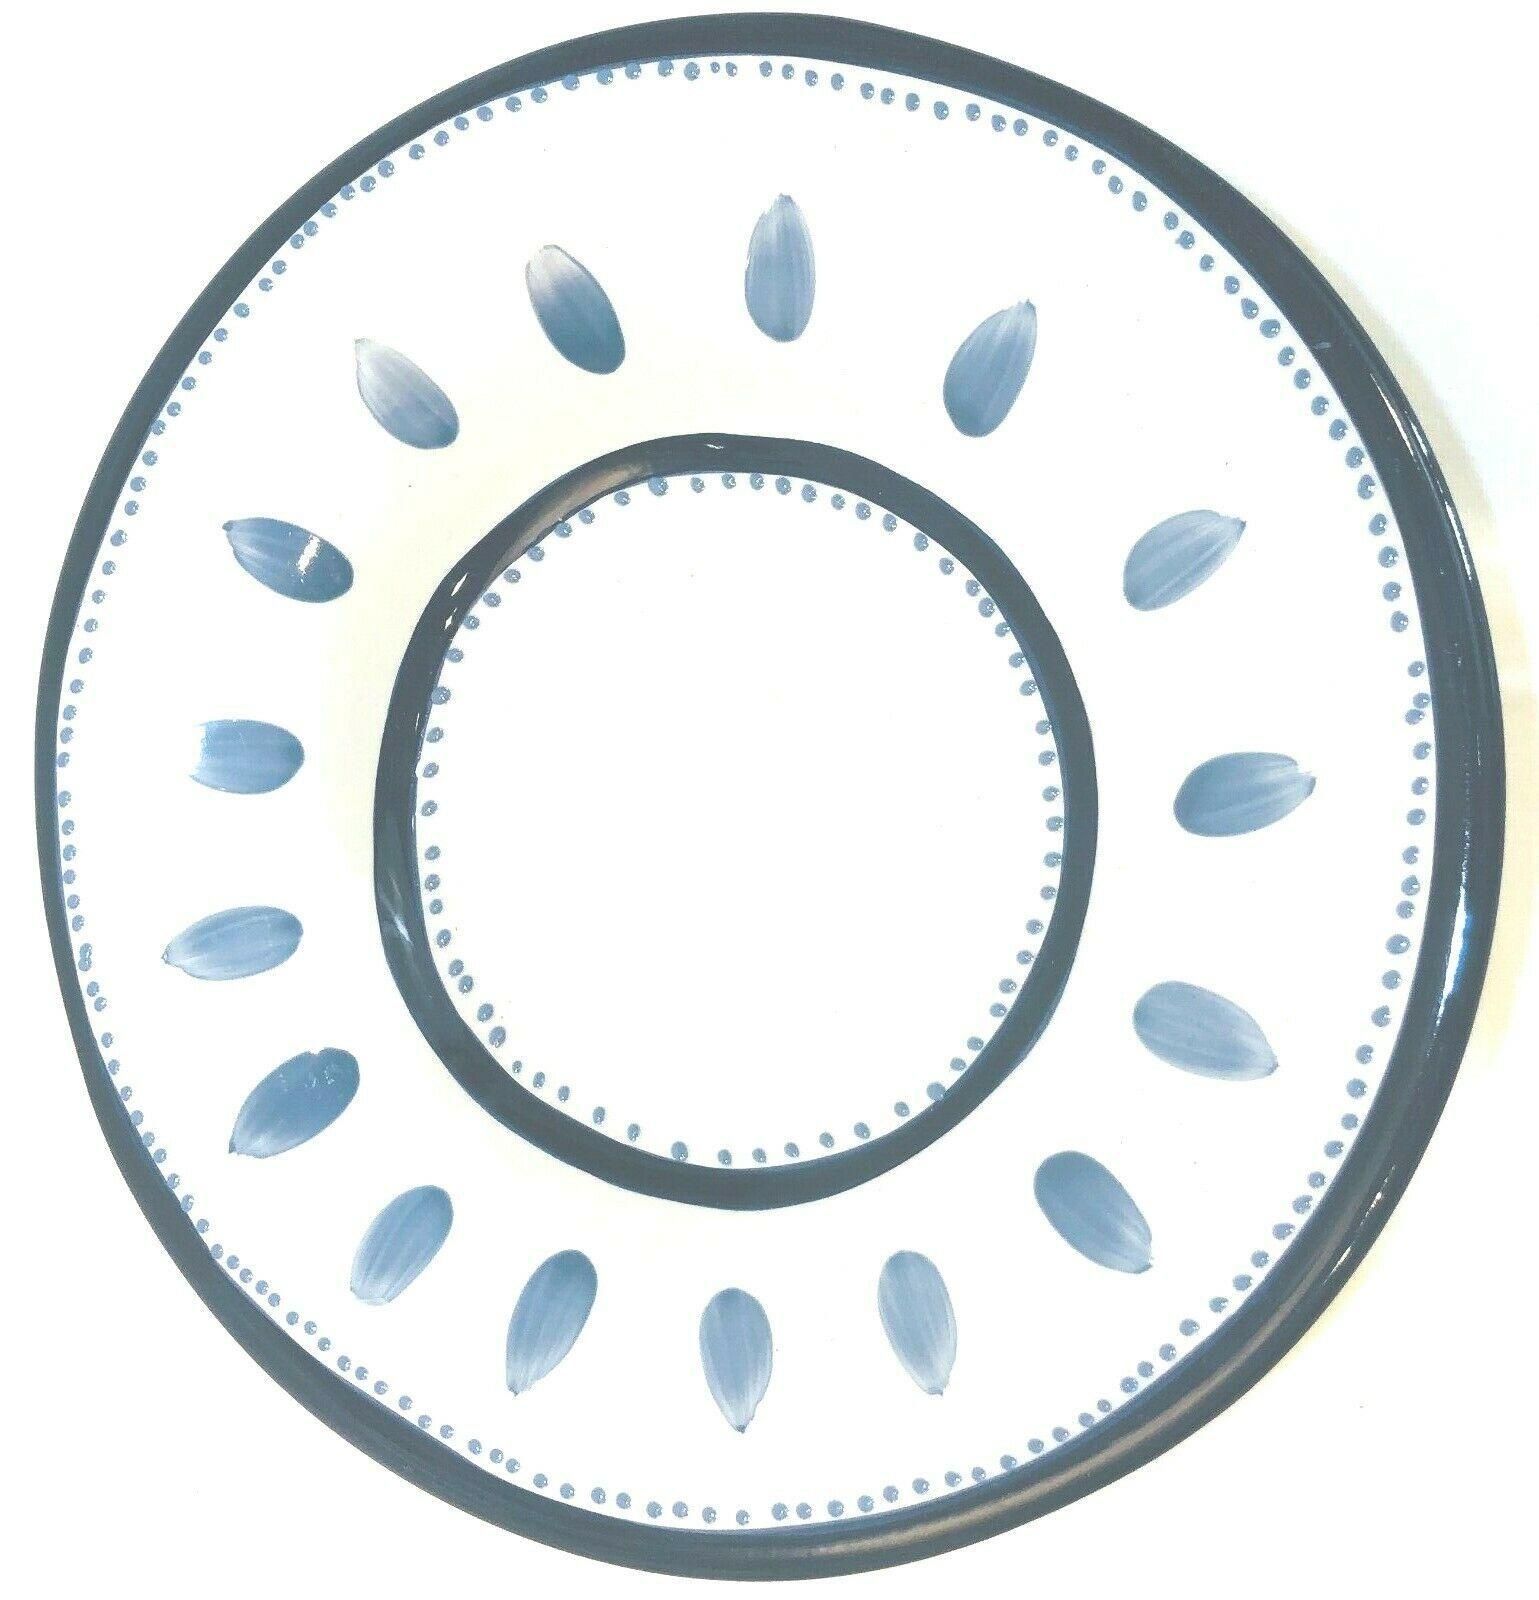 Pottery Barn Tiburon Blue & White Dinnerware Collection